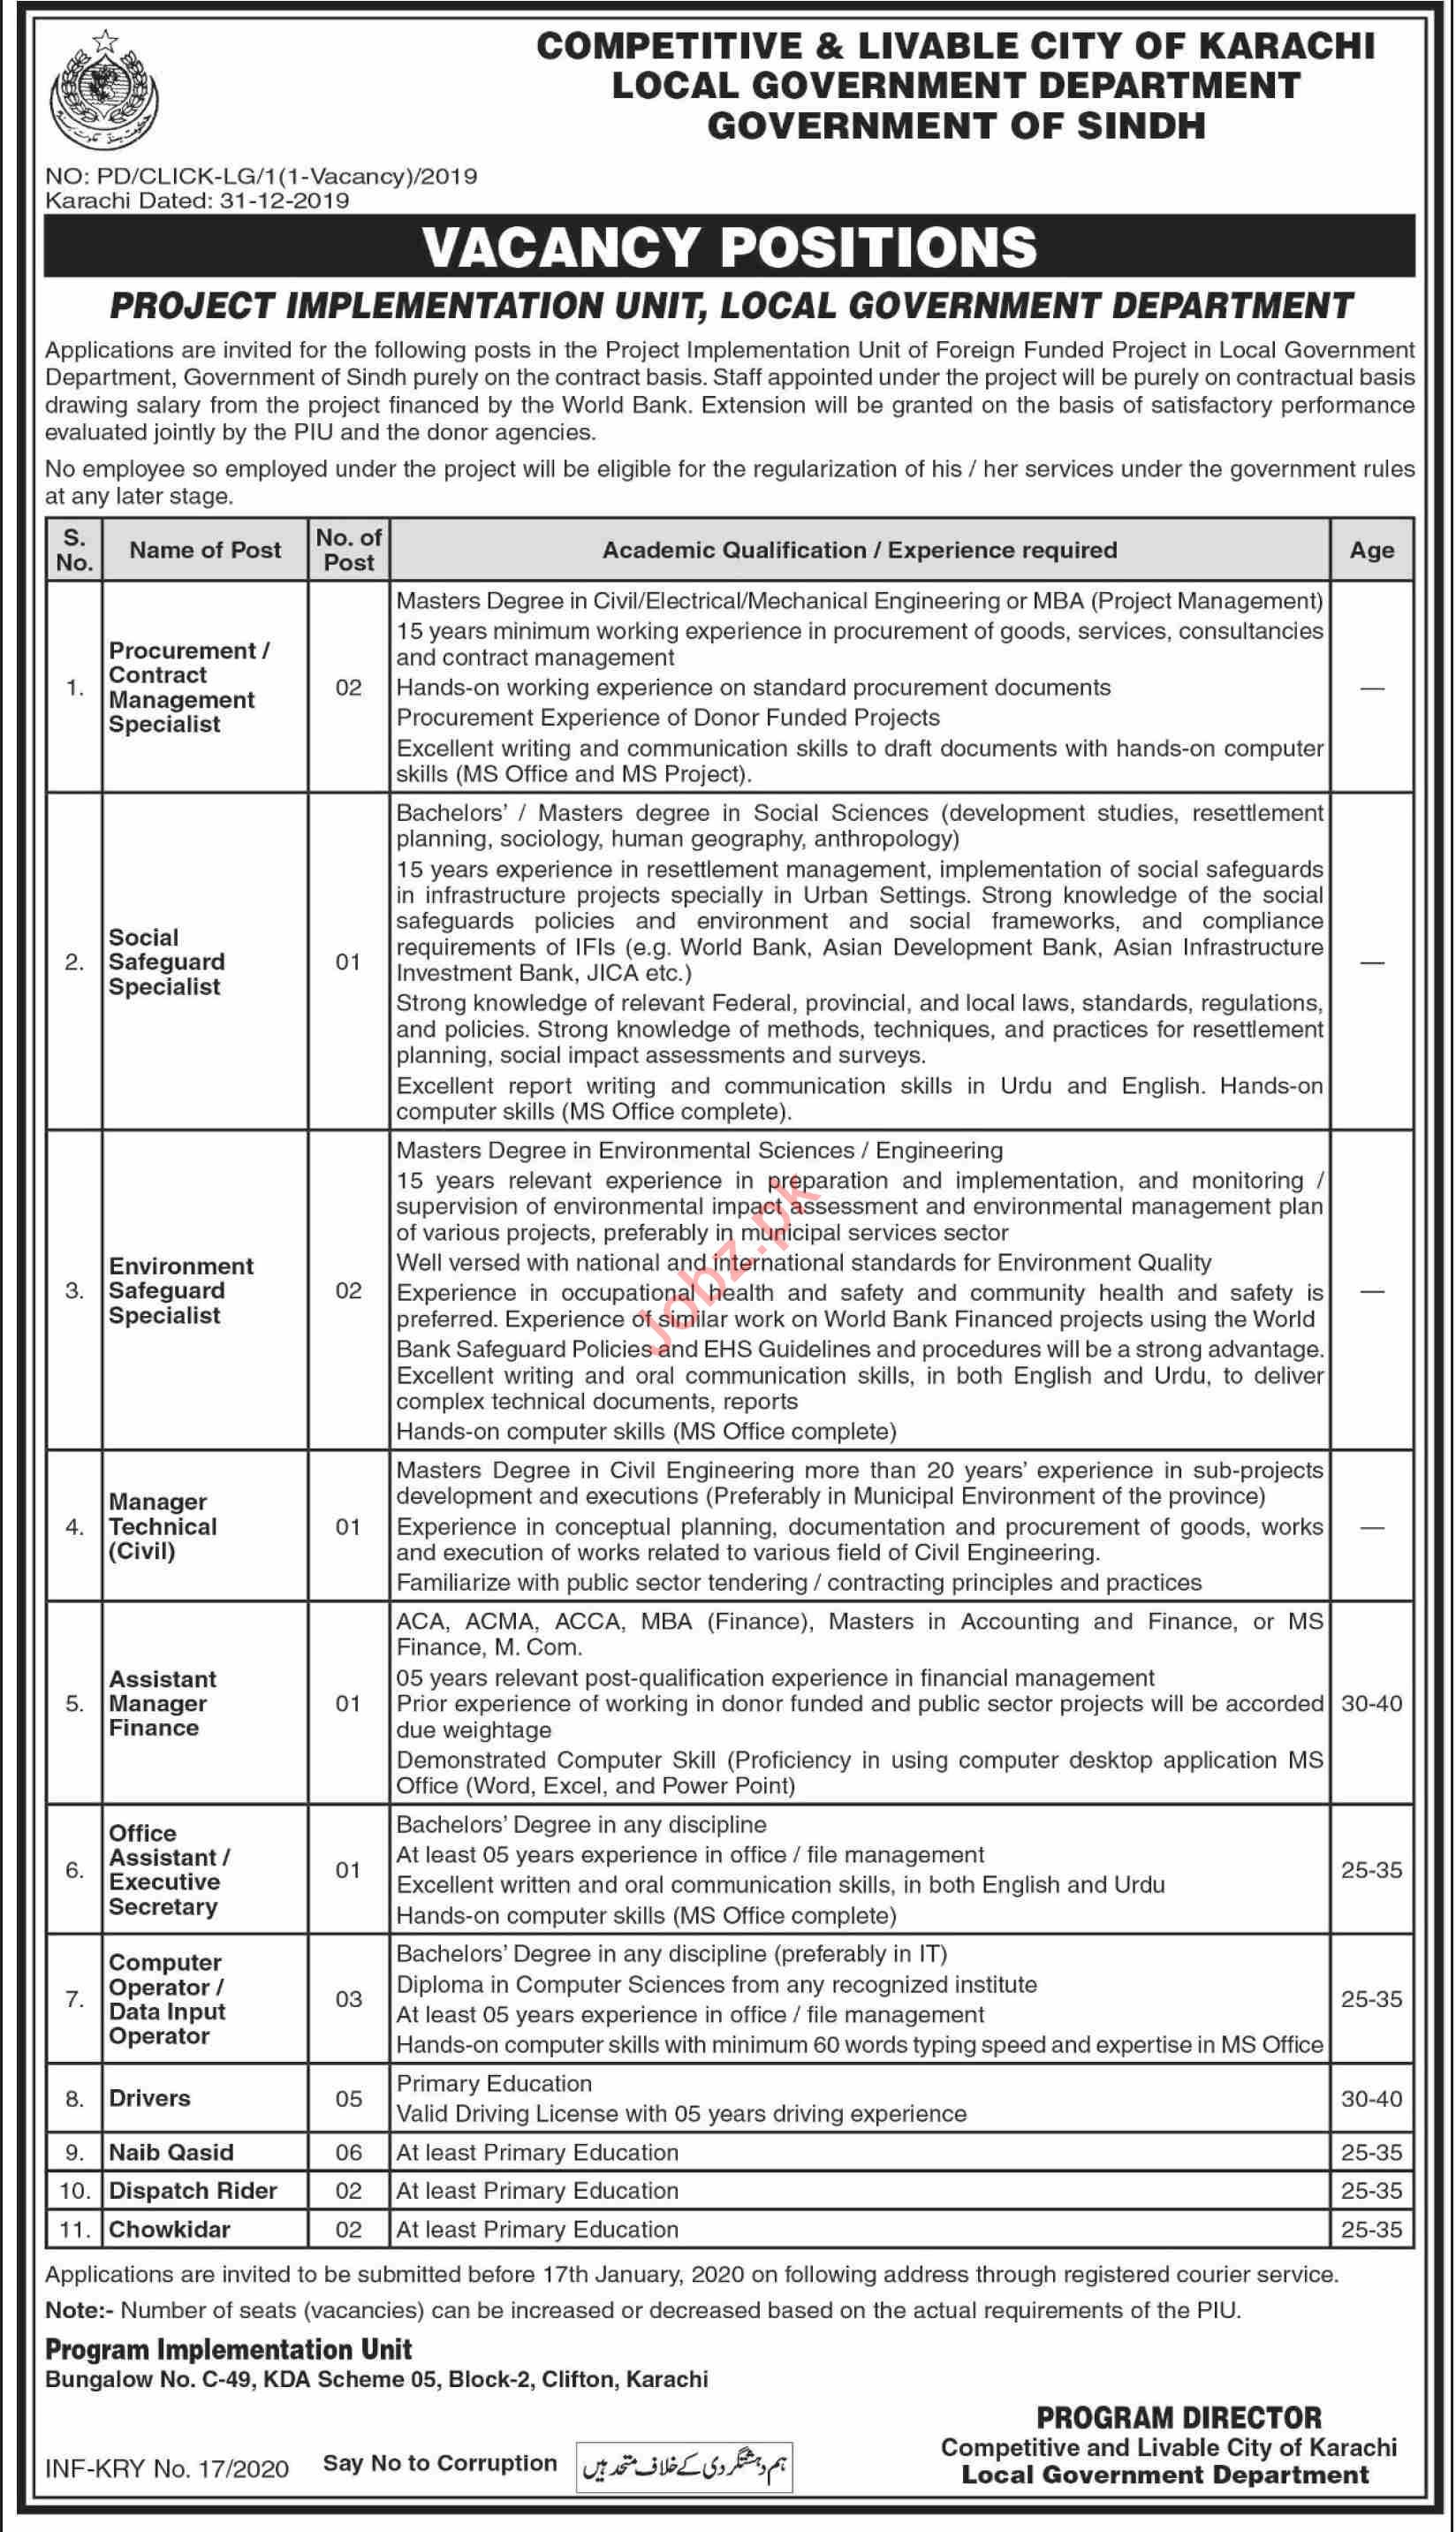 Competitive & Livable City of Karachi Project Jobs 2020